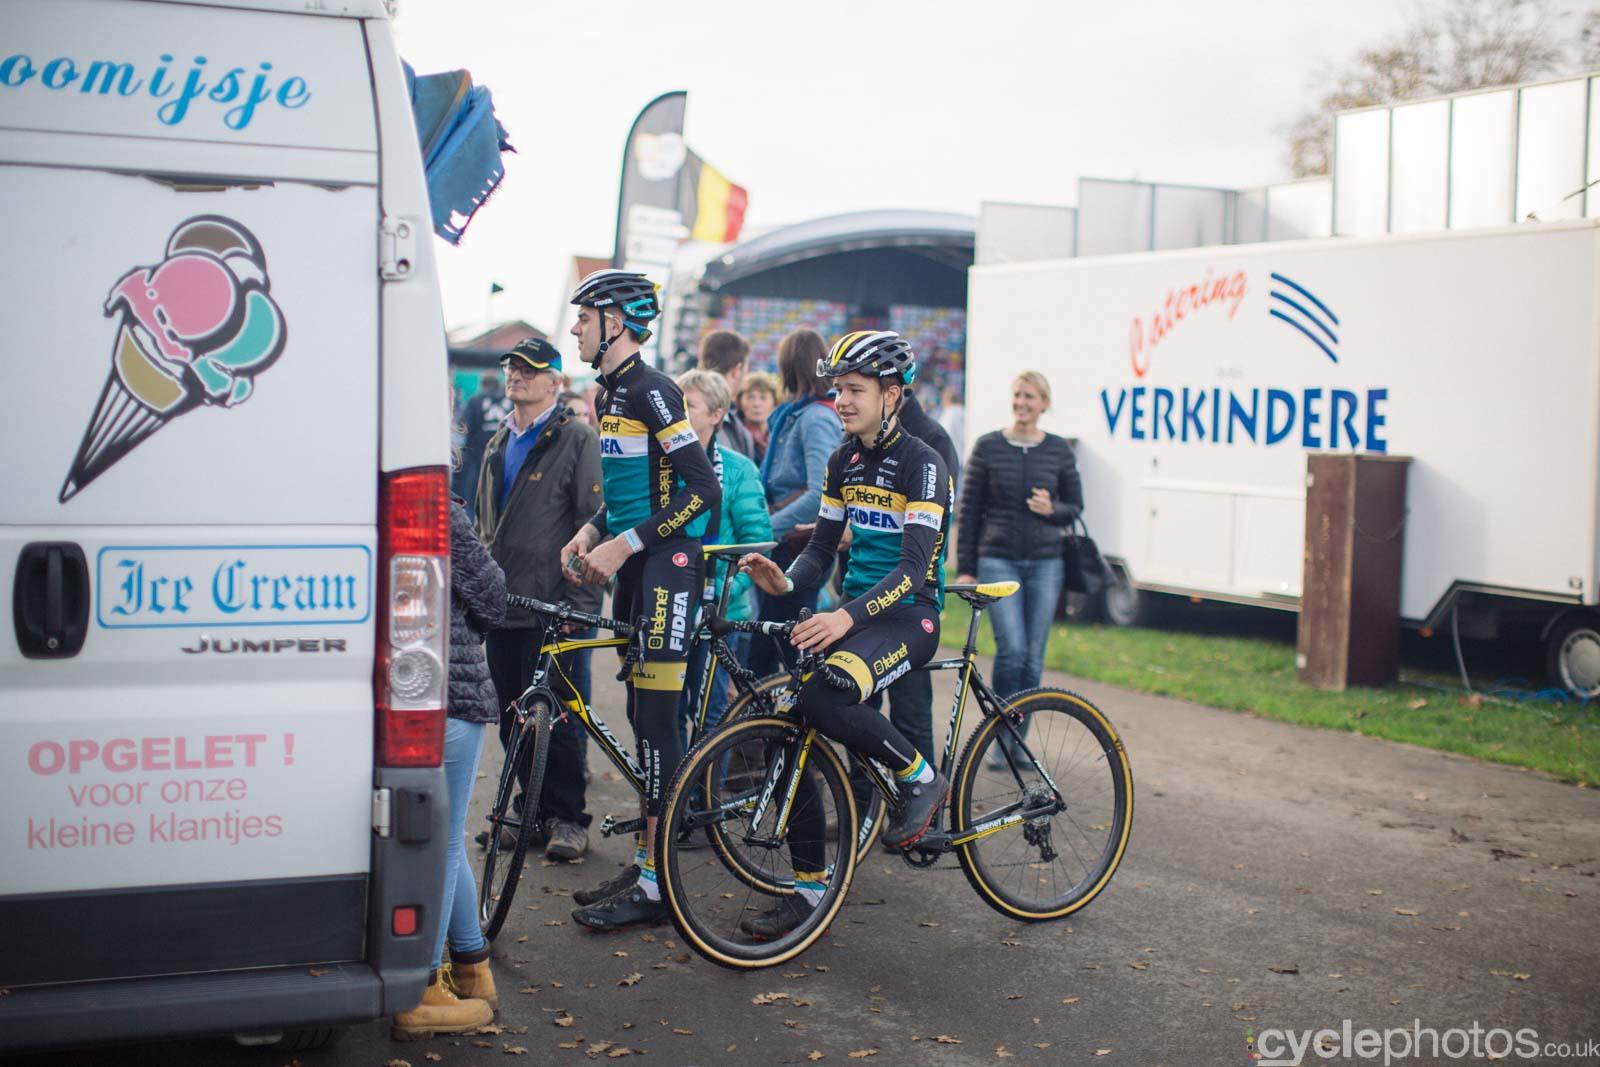 2015-cyclephotos-cyclocross-ruddervoorde-135702